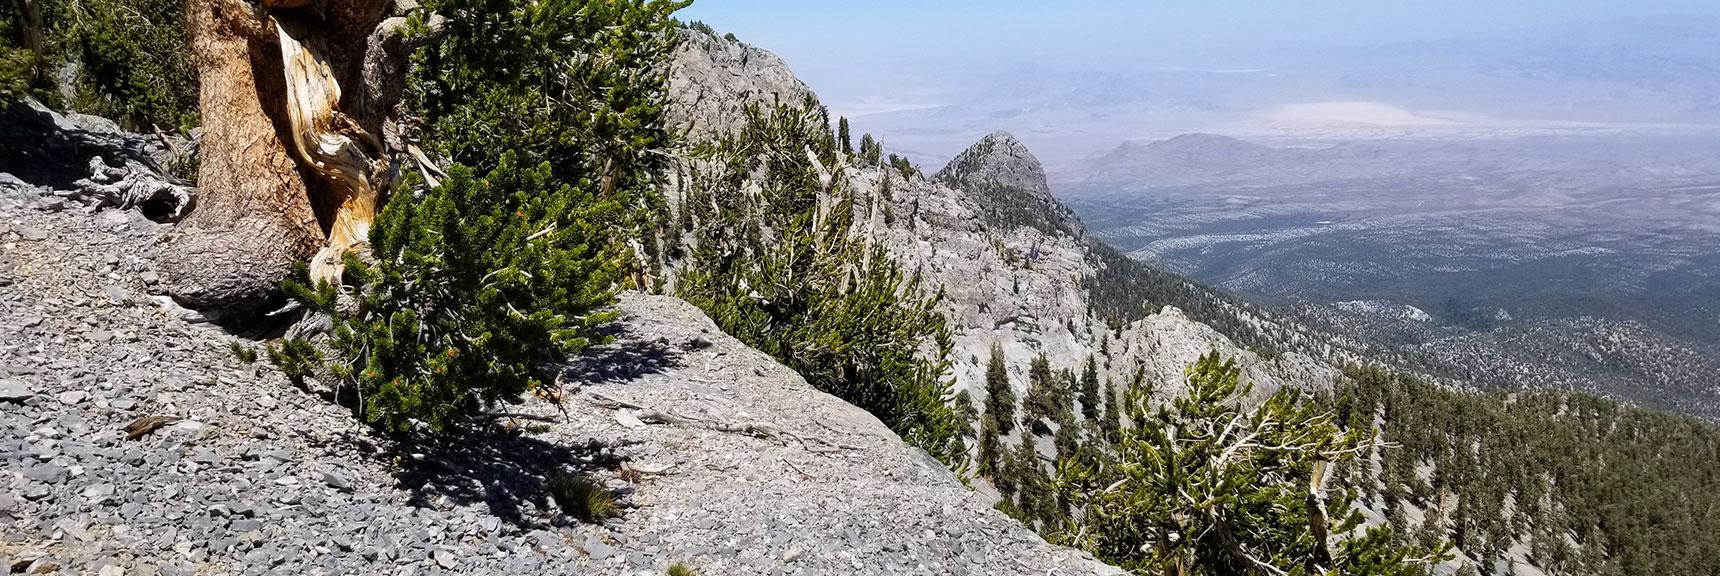 Mummy Mt. East Final Summit Approach Ledge in Mt. Charleston Wilderness, Nevada